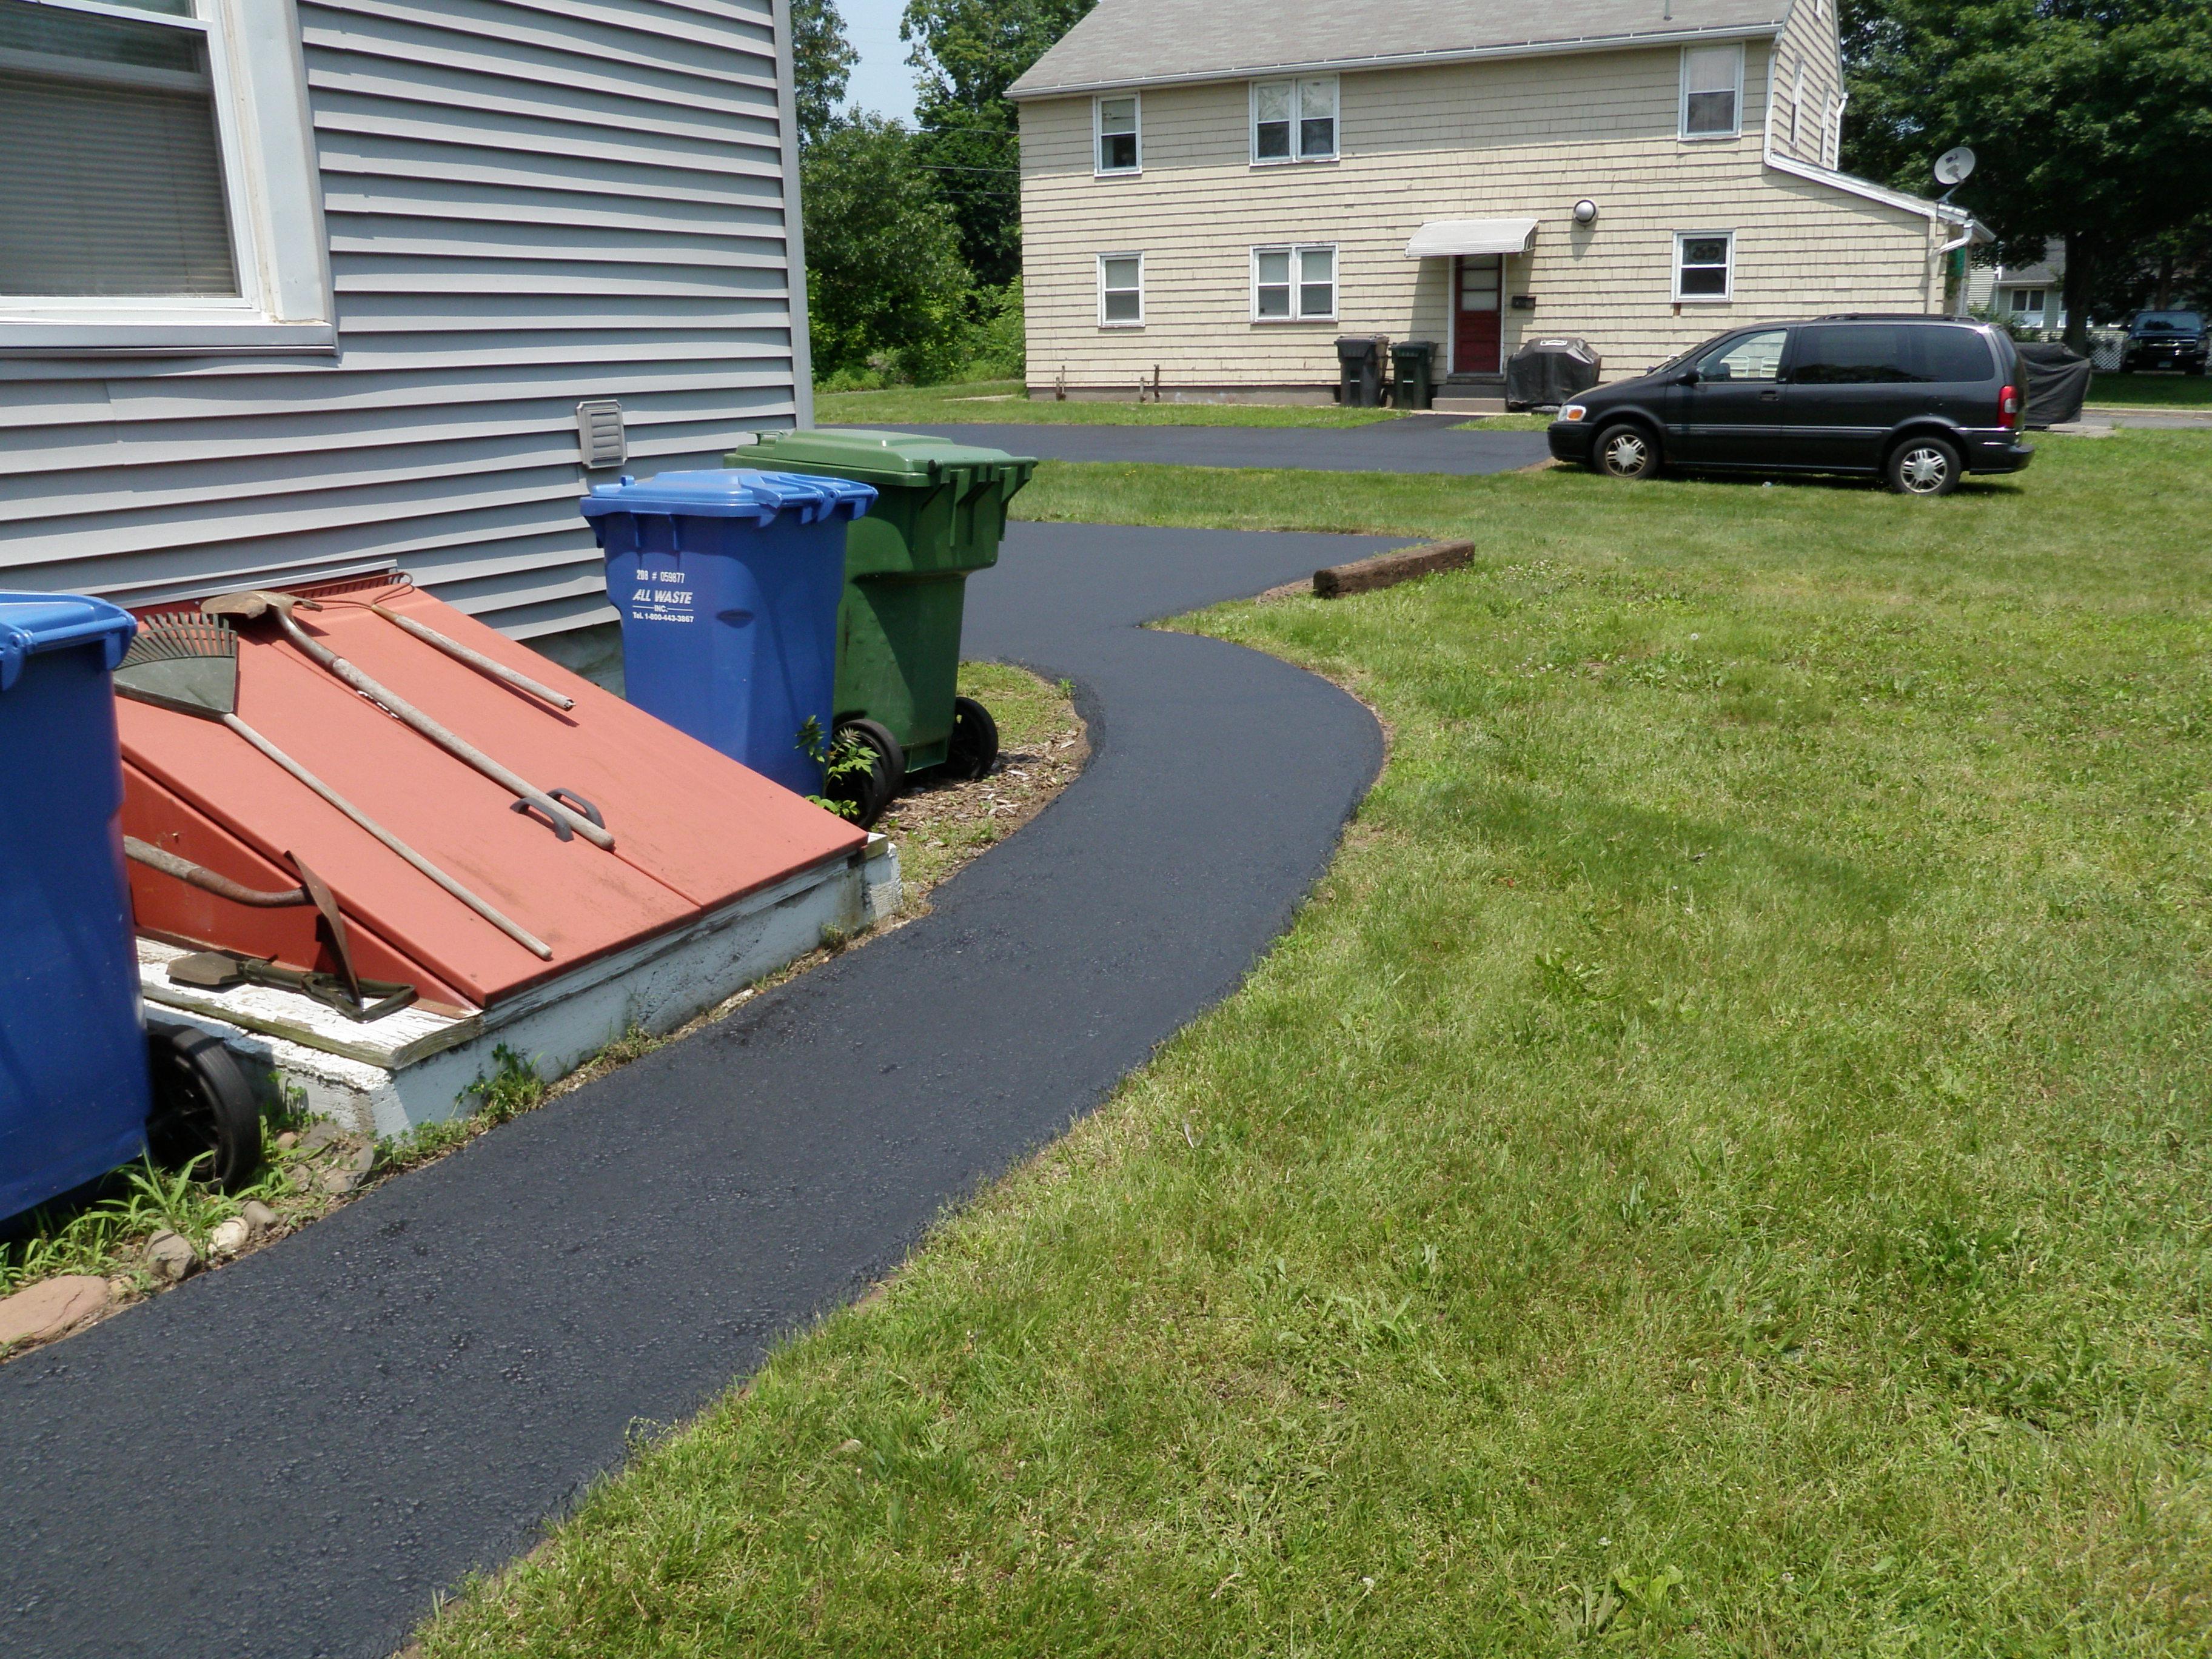 Sidewalk on Side of House Sealed